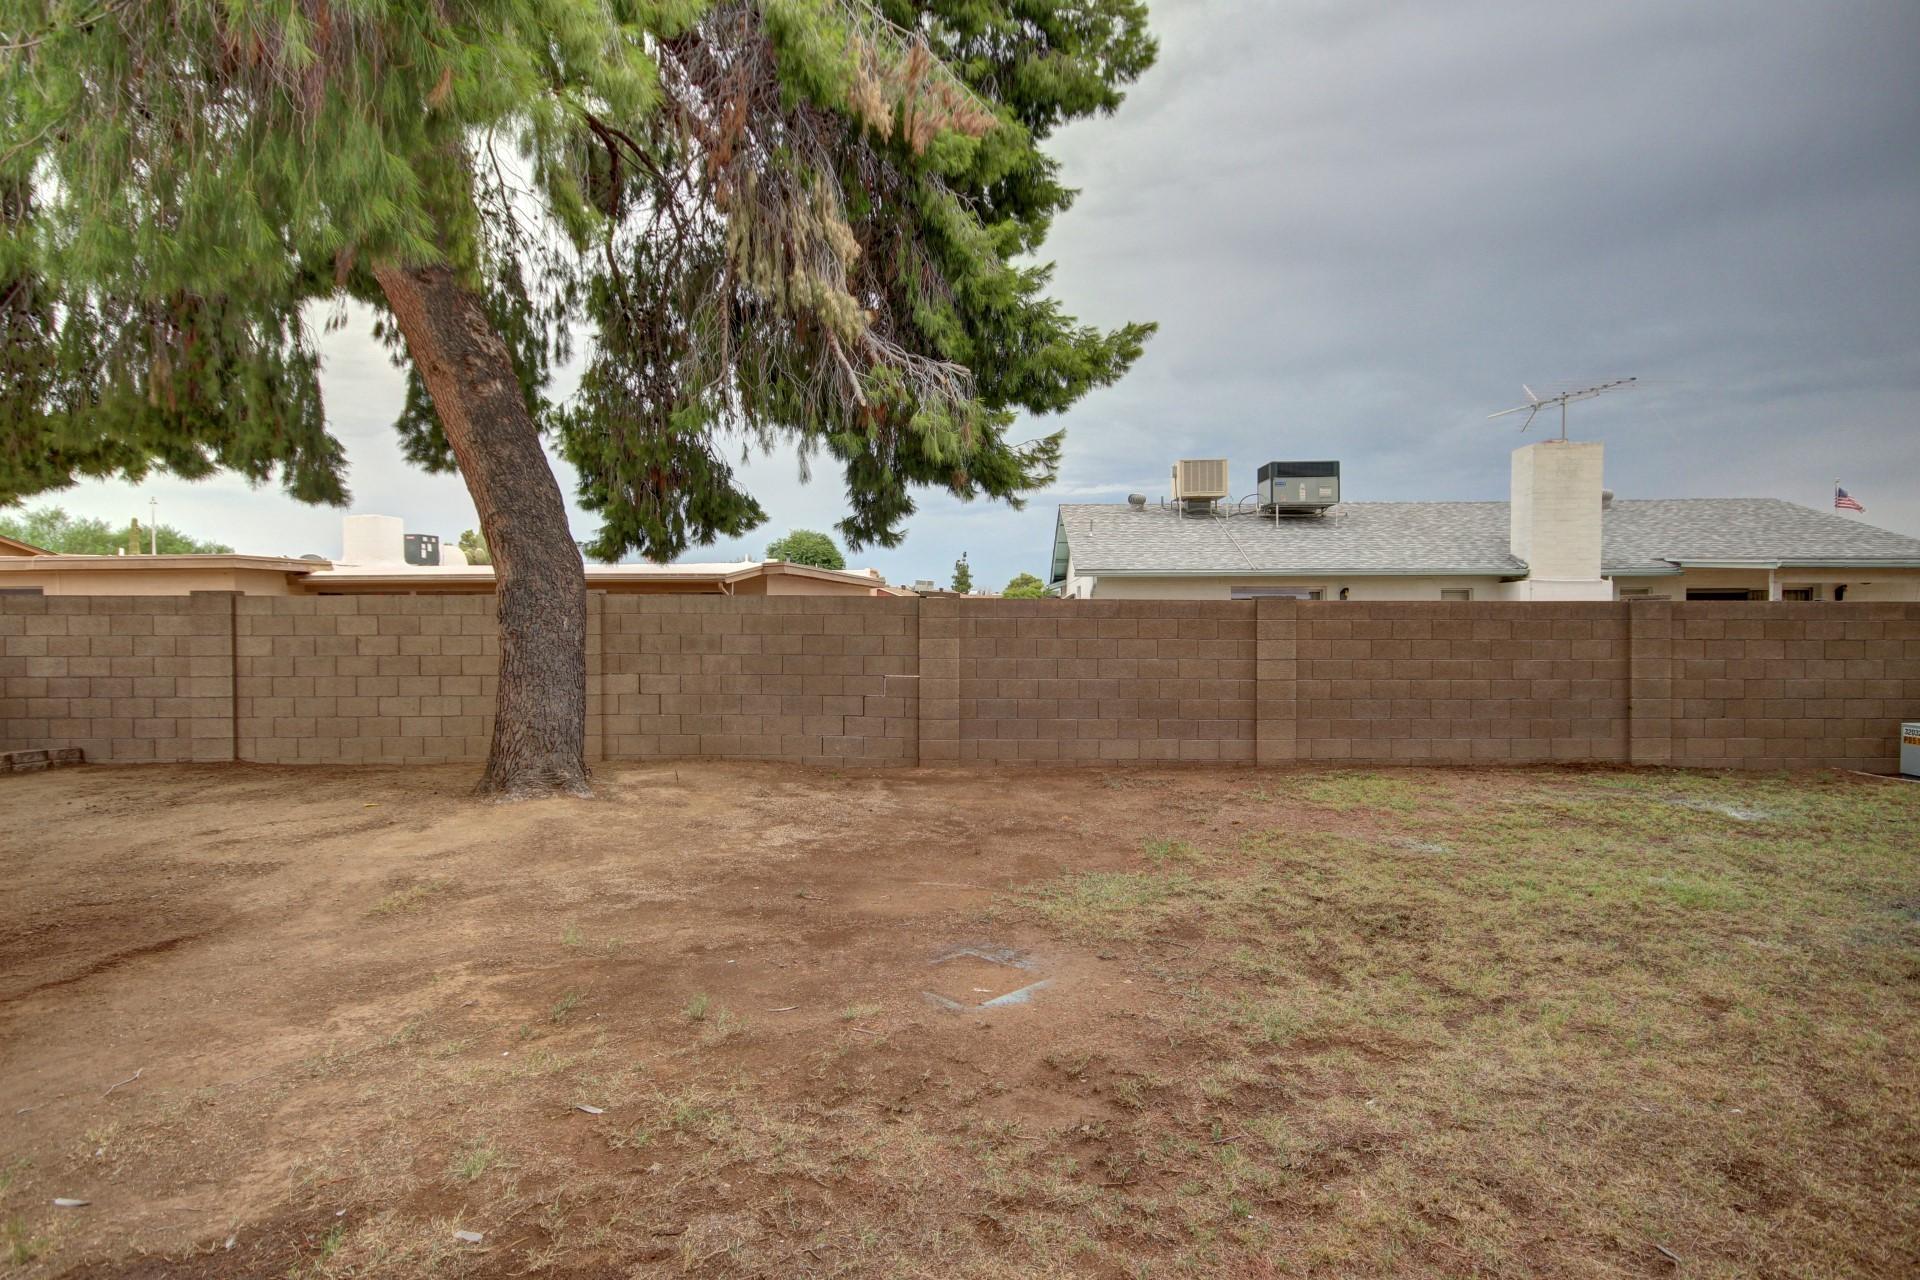 Glendale Arizona yard with pine trees